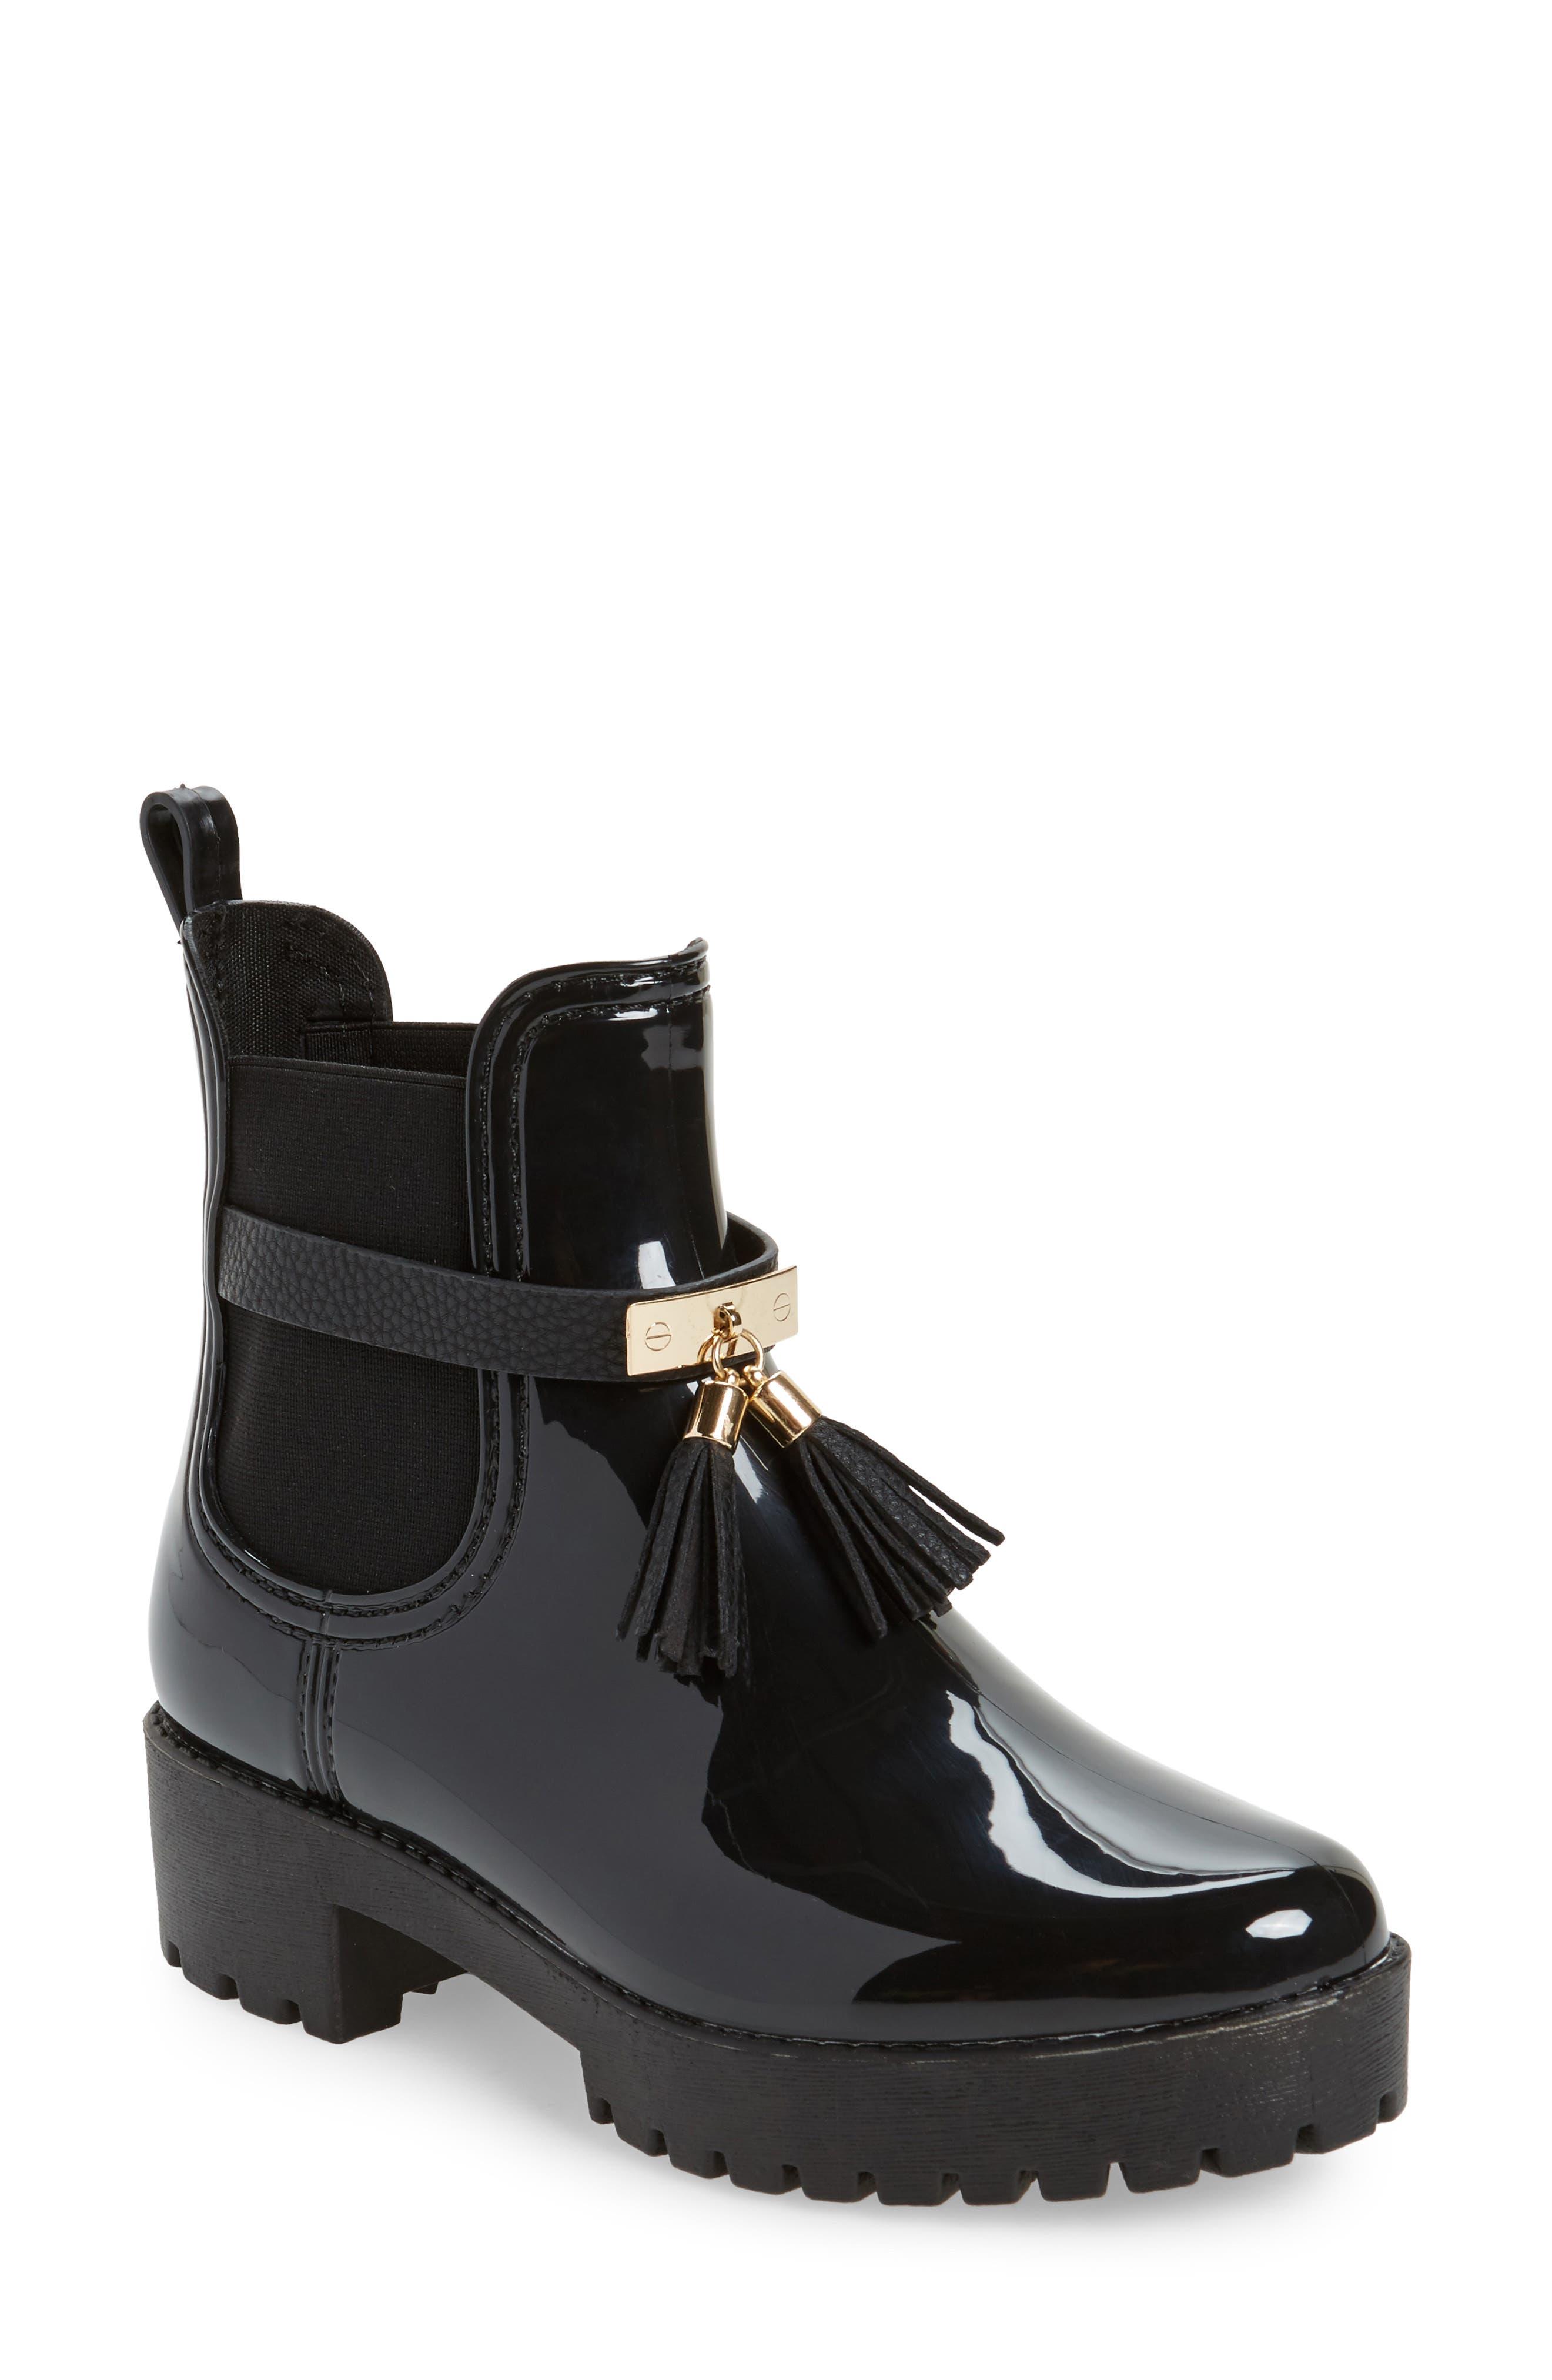 Main Image - däv Leeds Tassel Waterproof Chelsea Boot (Women)